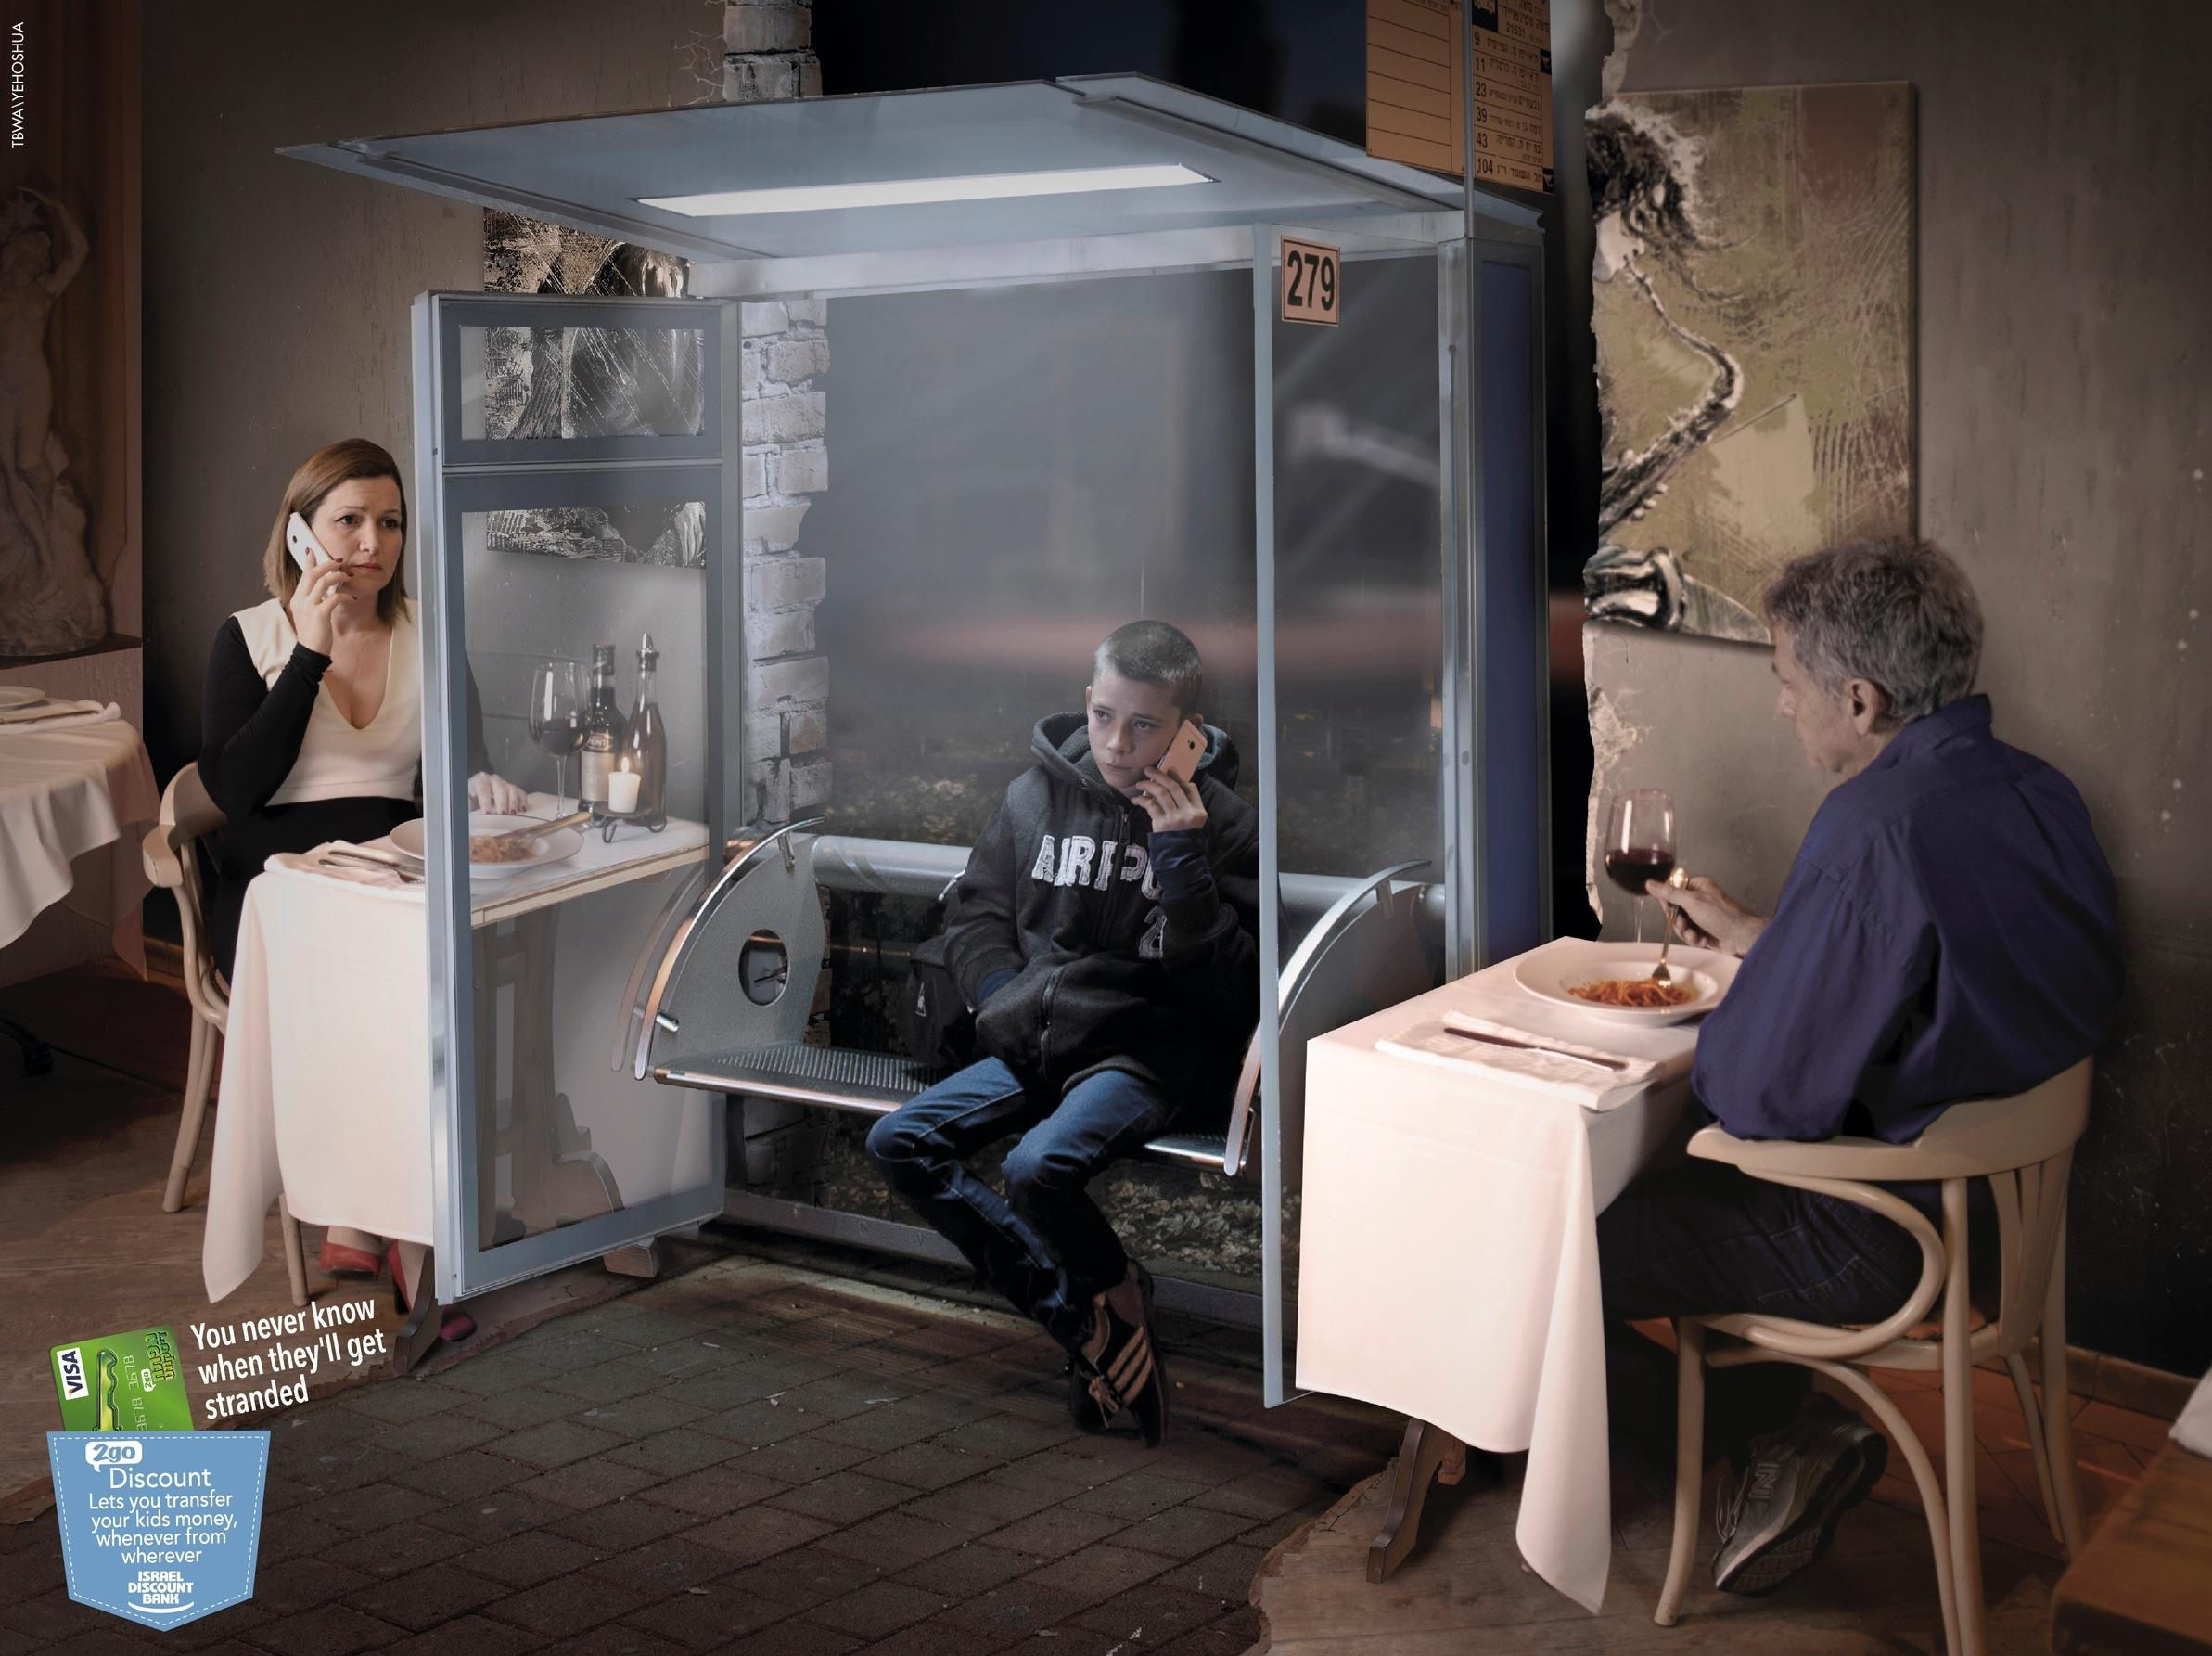 Israel Discount Bank Print Ad -  Dinner